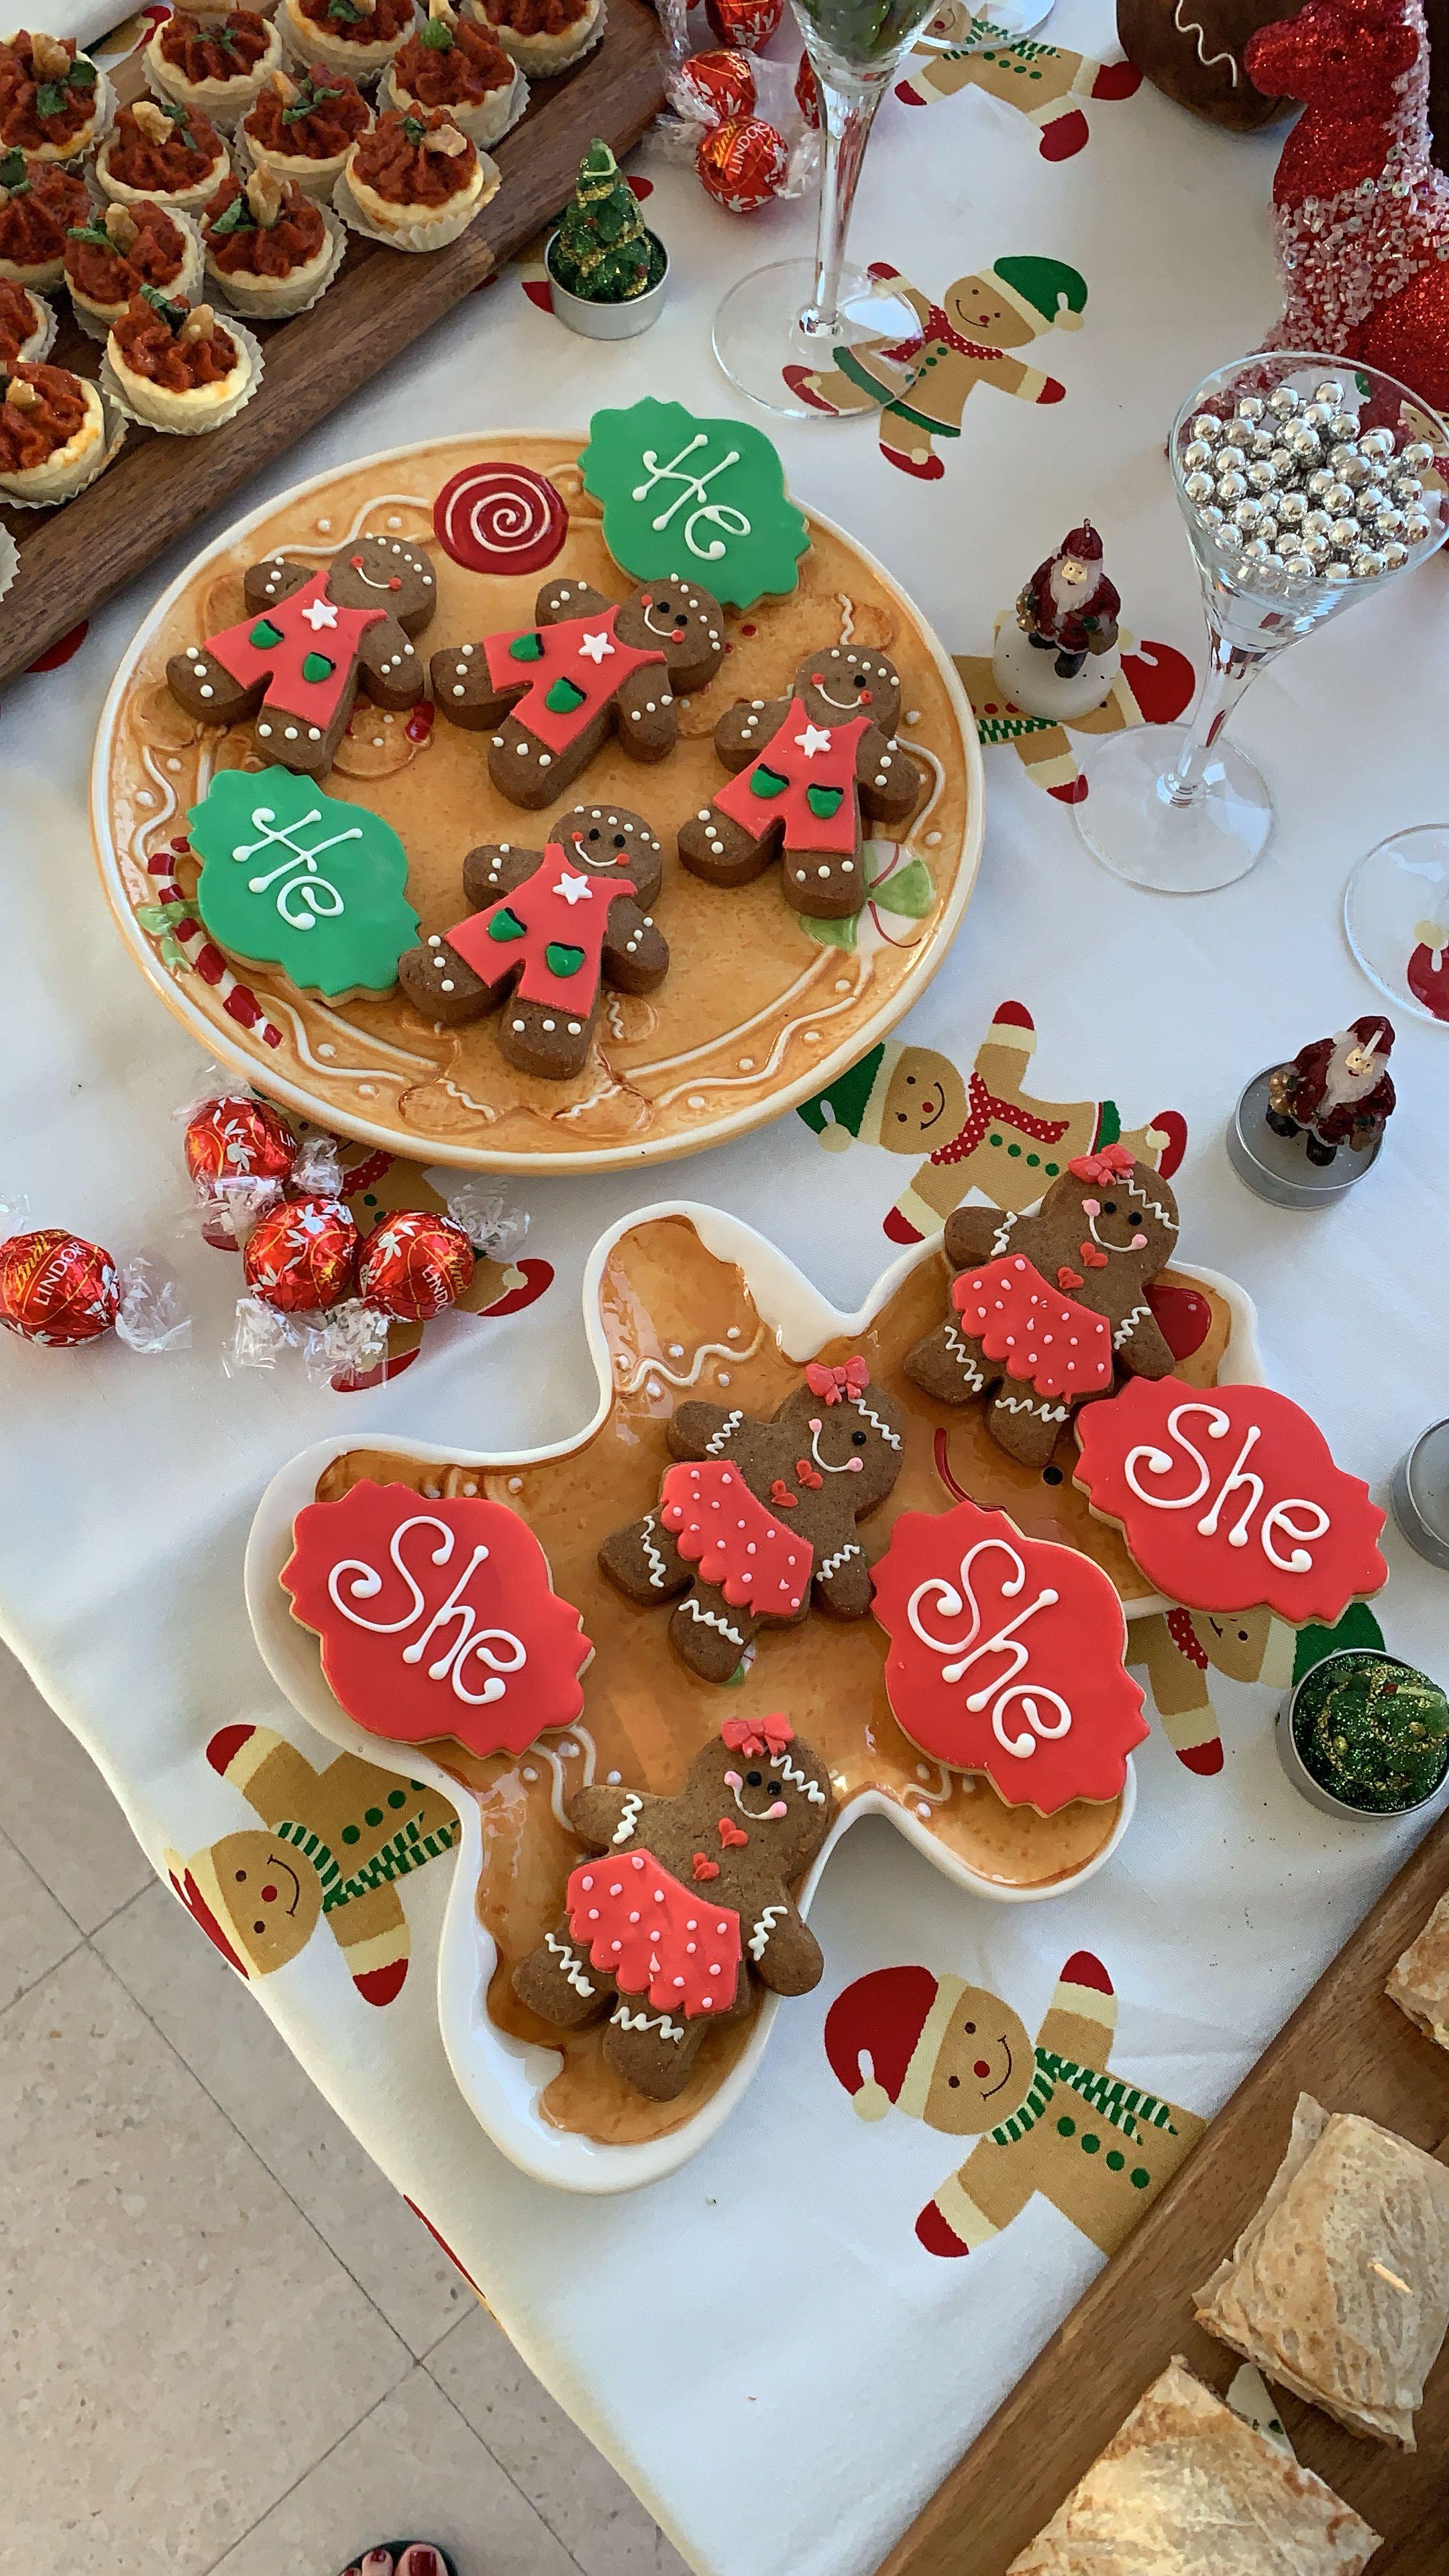 Christmas Gender Reveal Party Christmas Gender Reveal Gender Reveal Cookies Gender Reveal Party Food